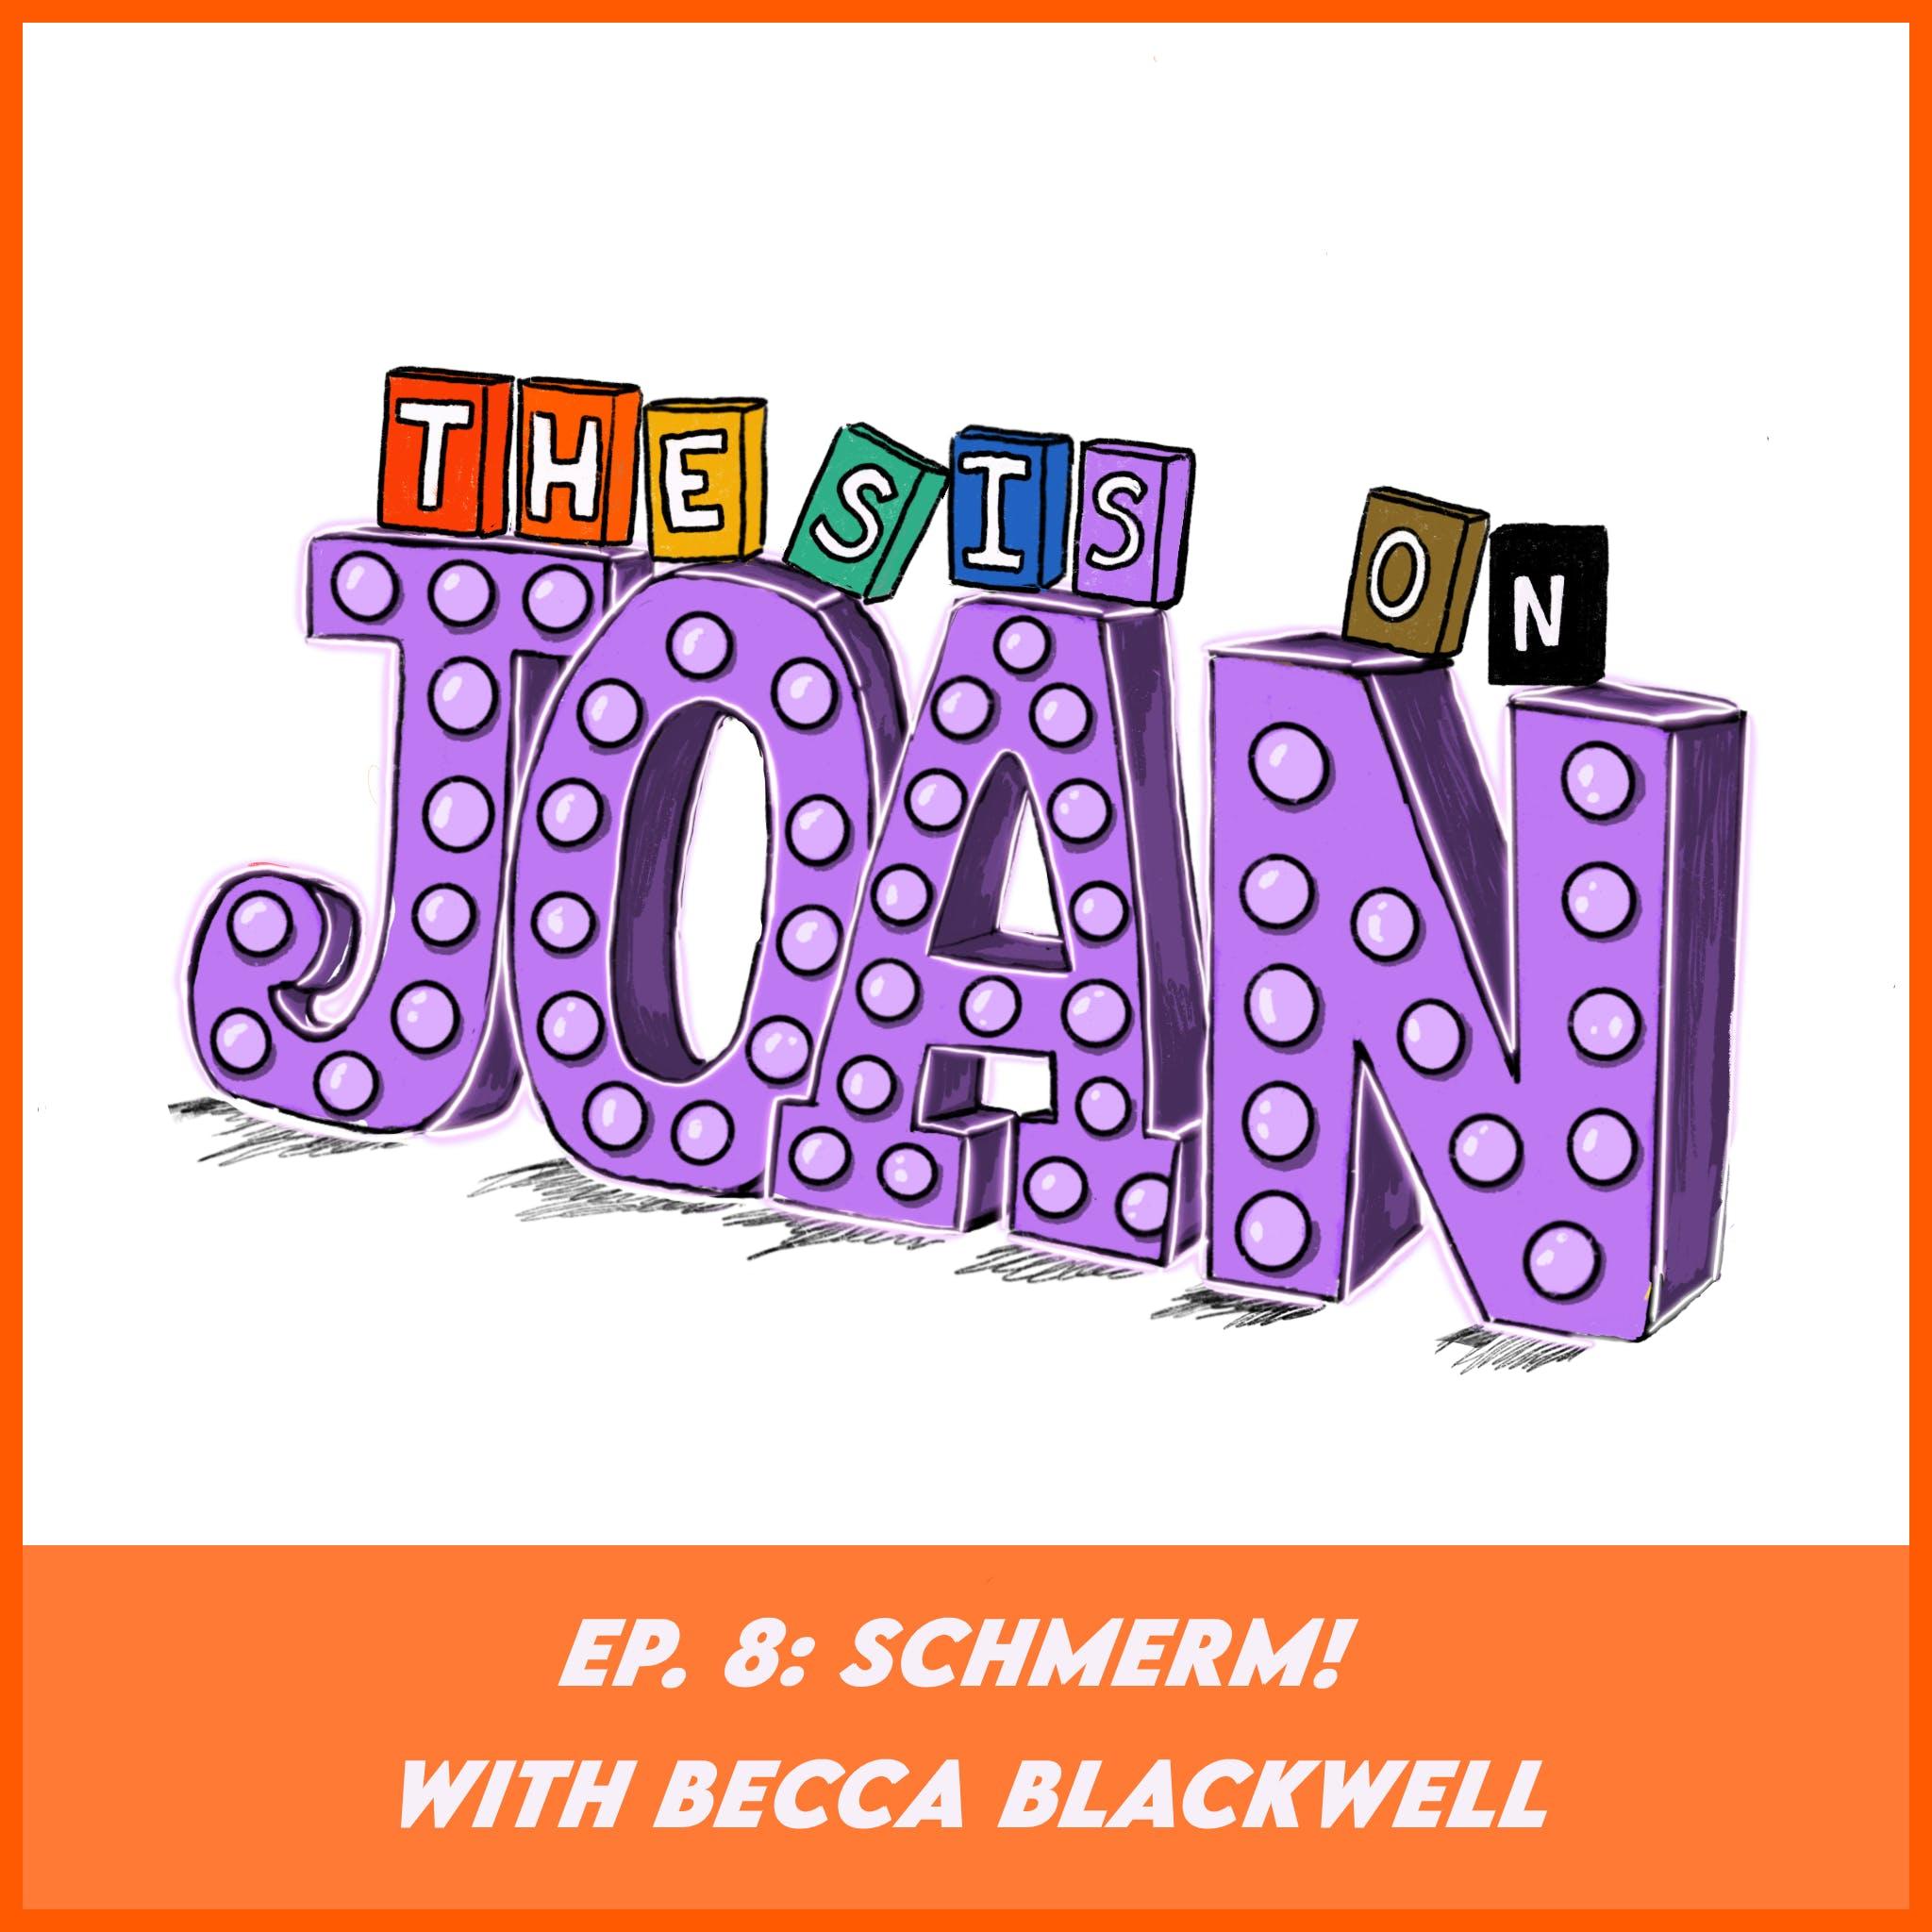 #8 Schmerm! With Becca Blackwell